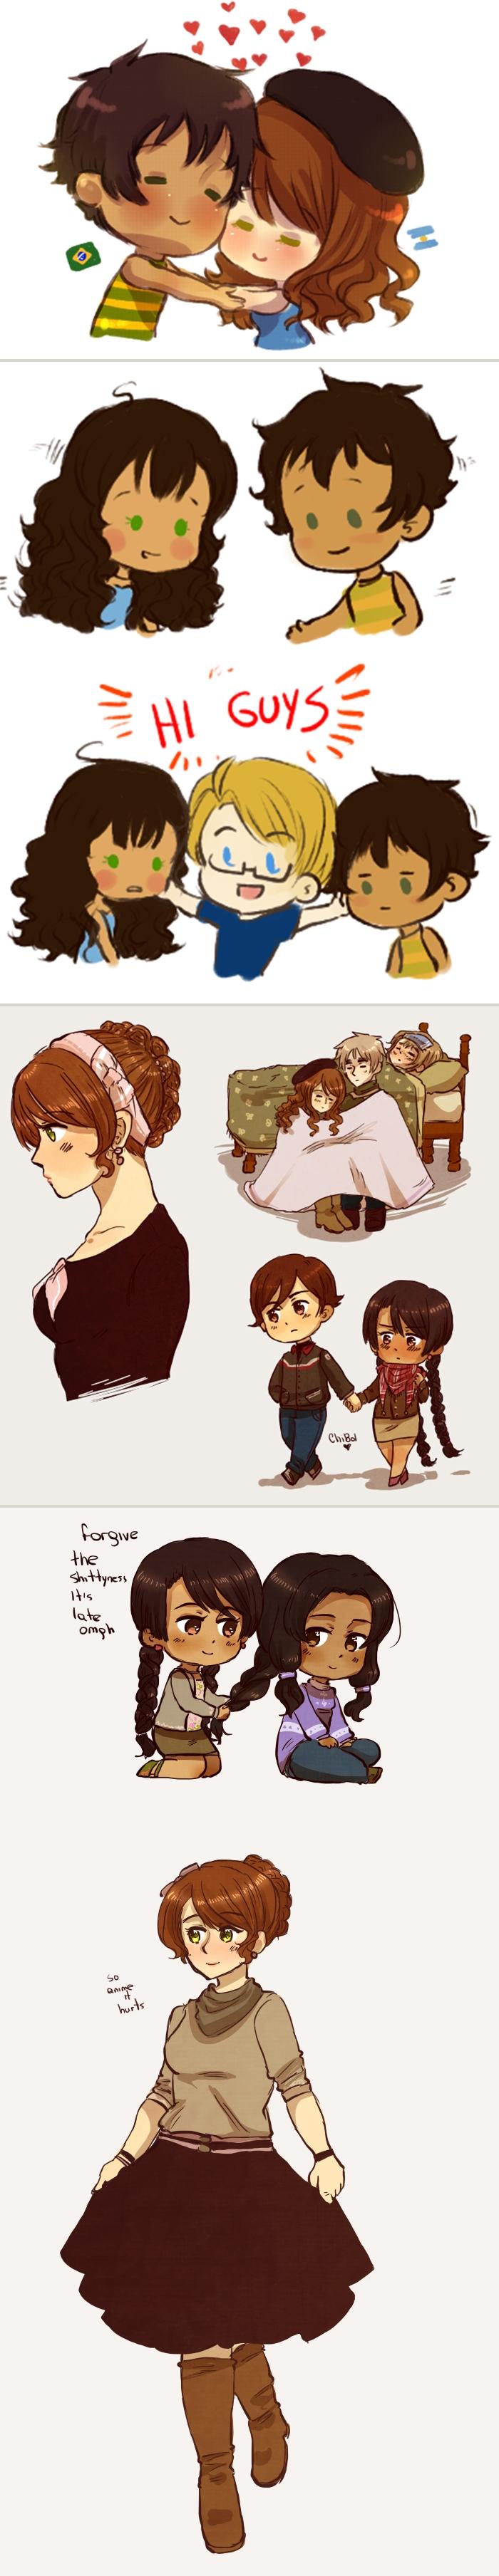 doodls by FlopyLopez